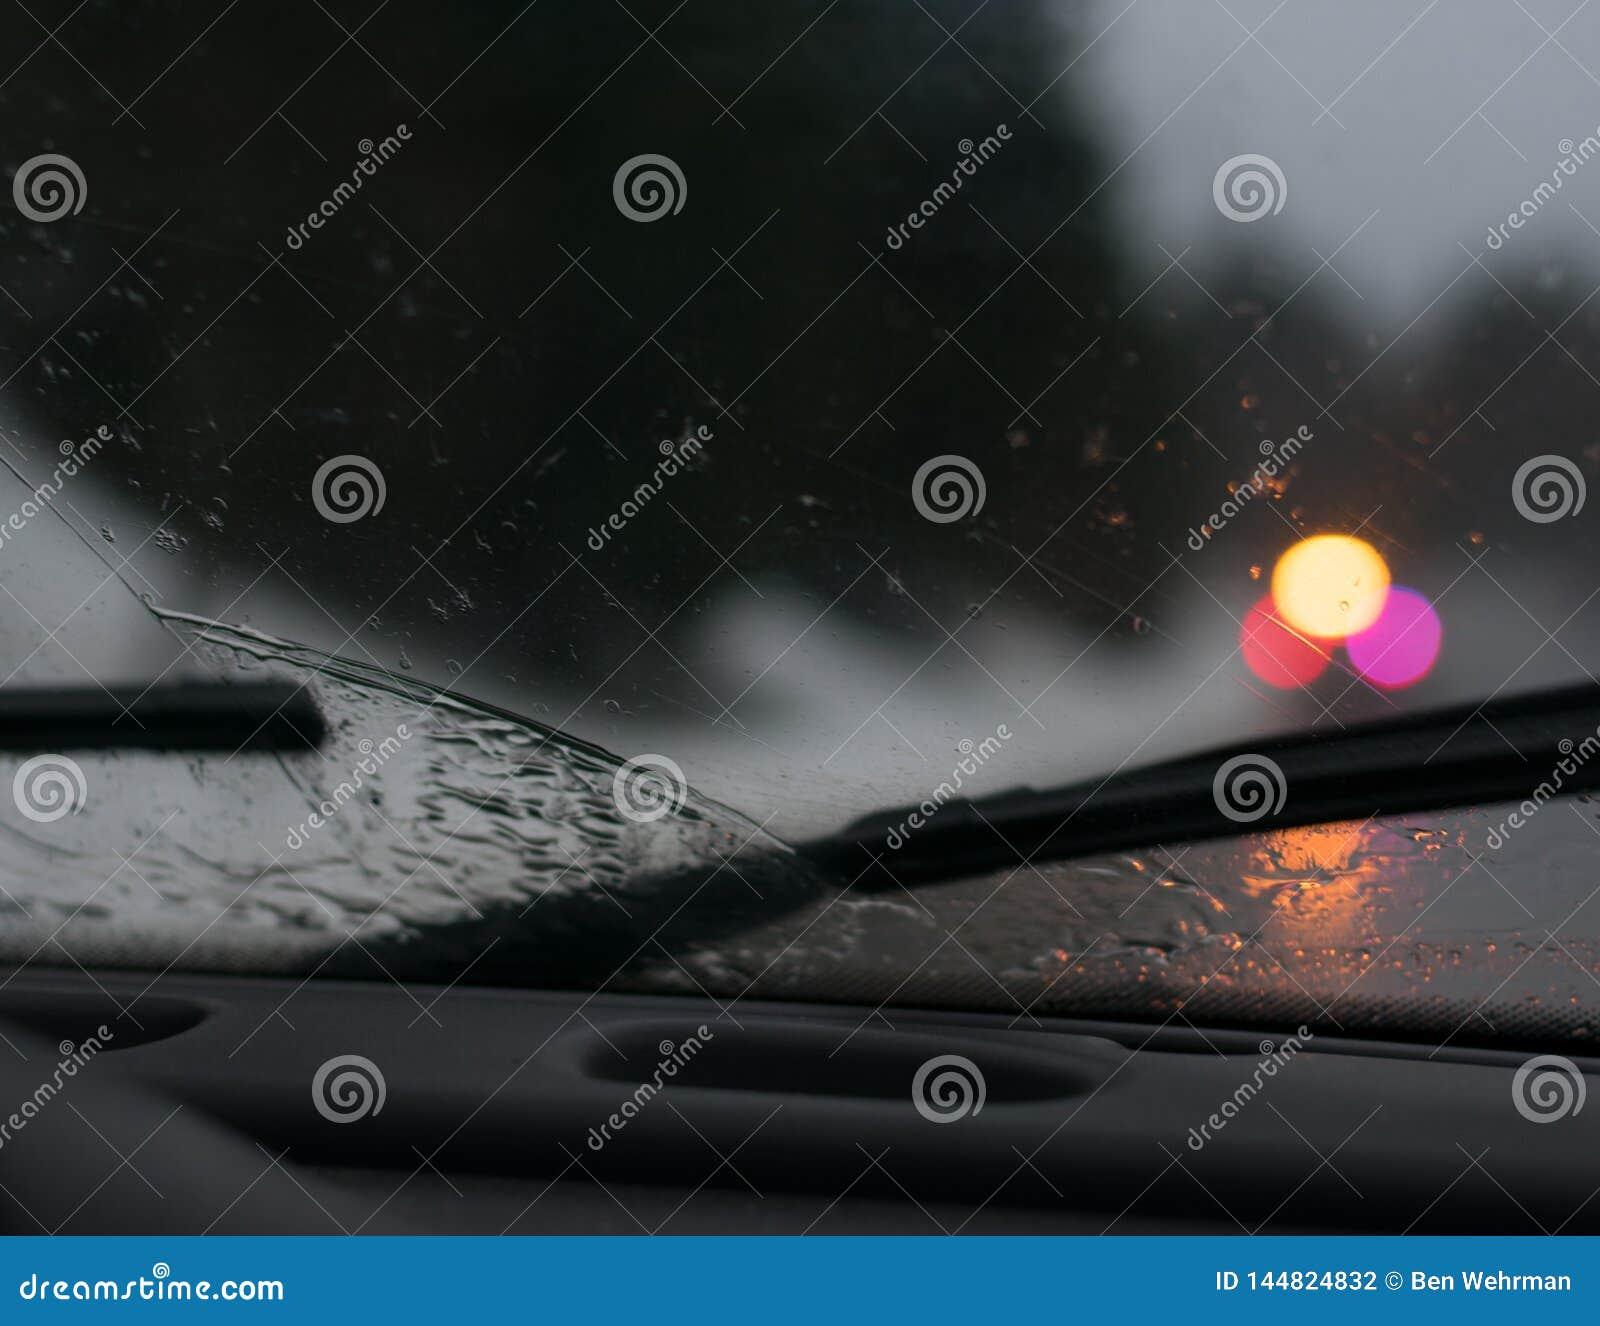 Commande pluvieuse une nuit orageuse